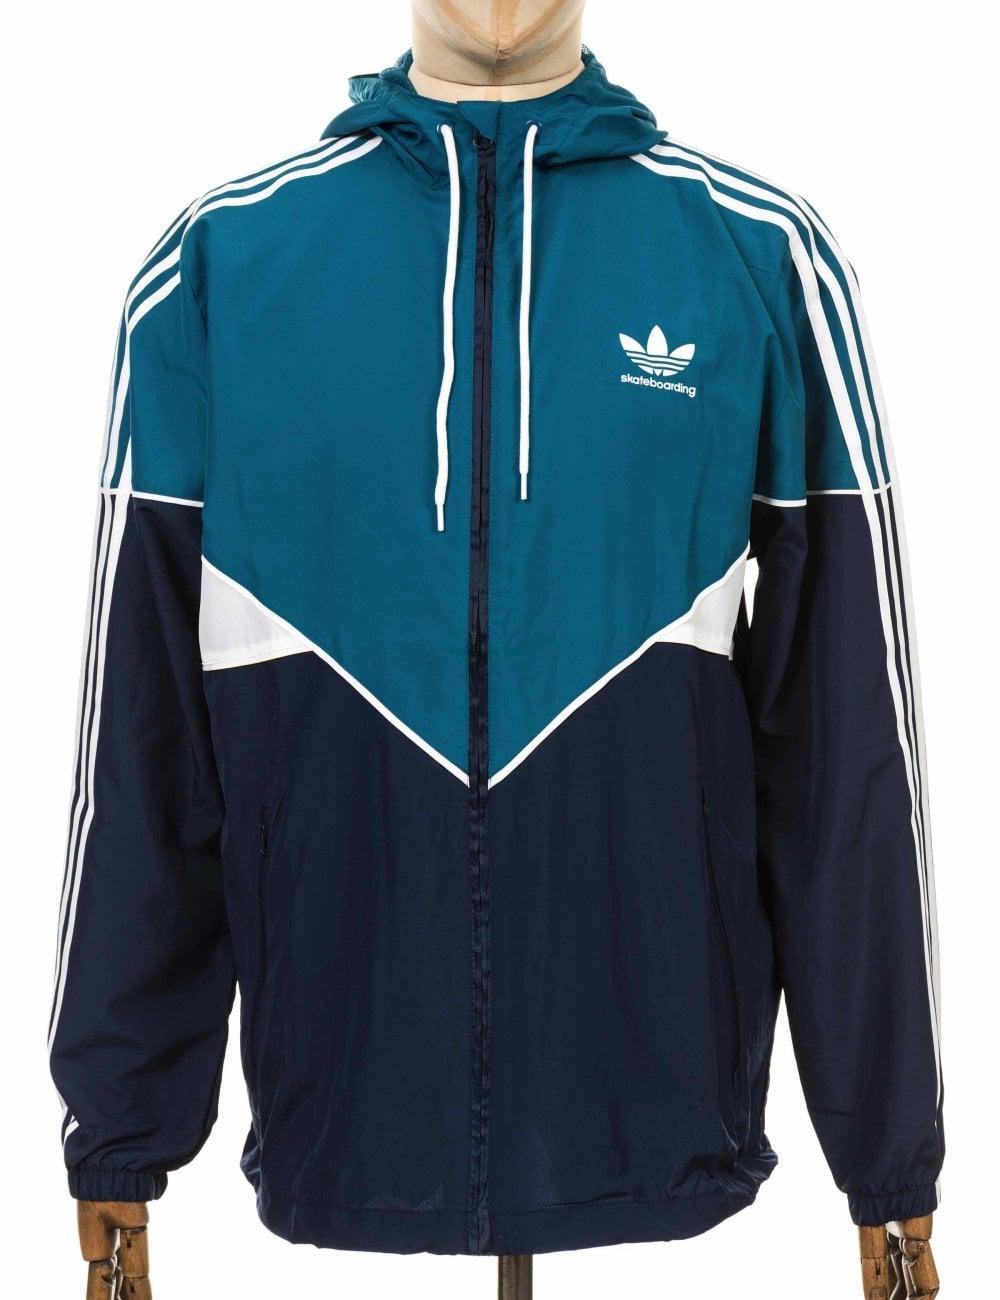 Premier WB Jacket Real TealCollegiate Navy